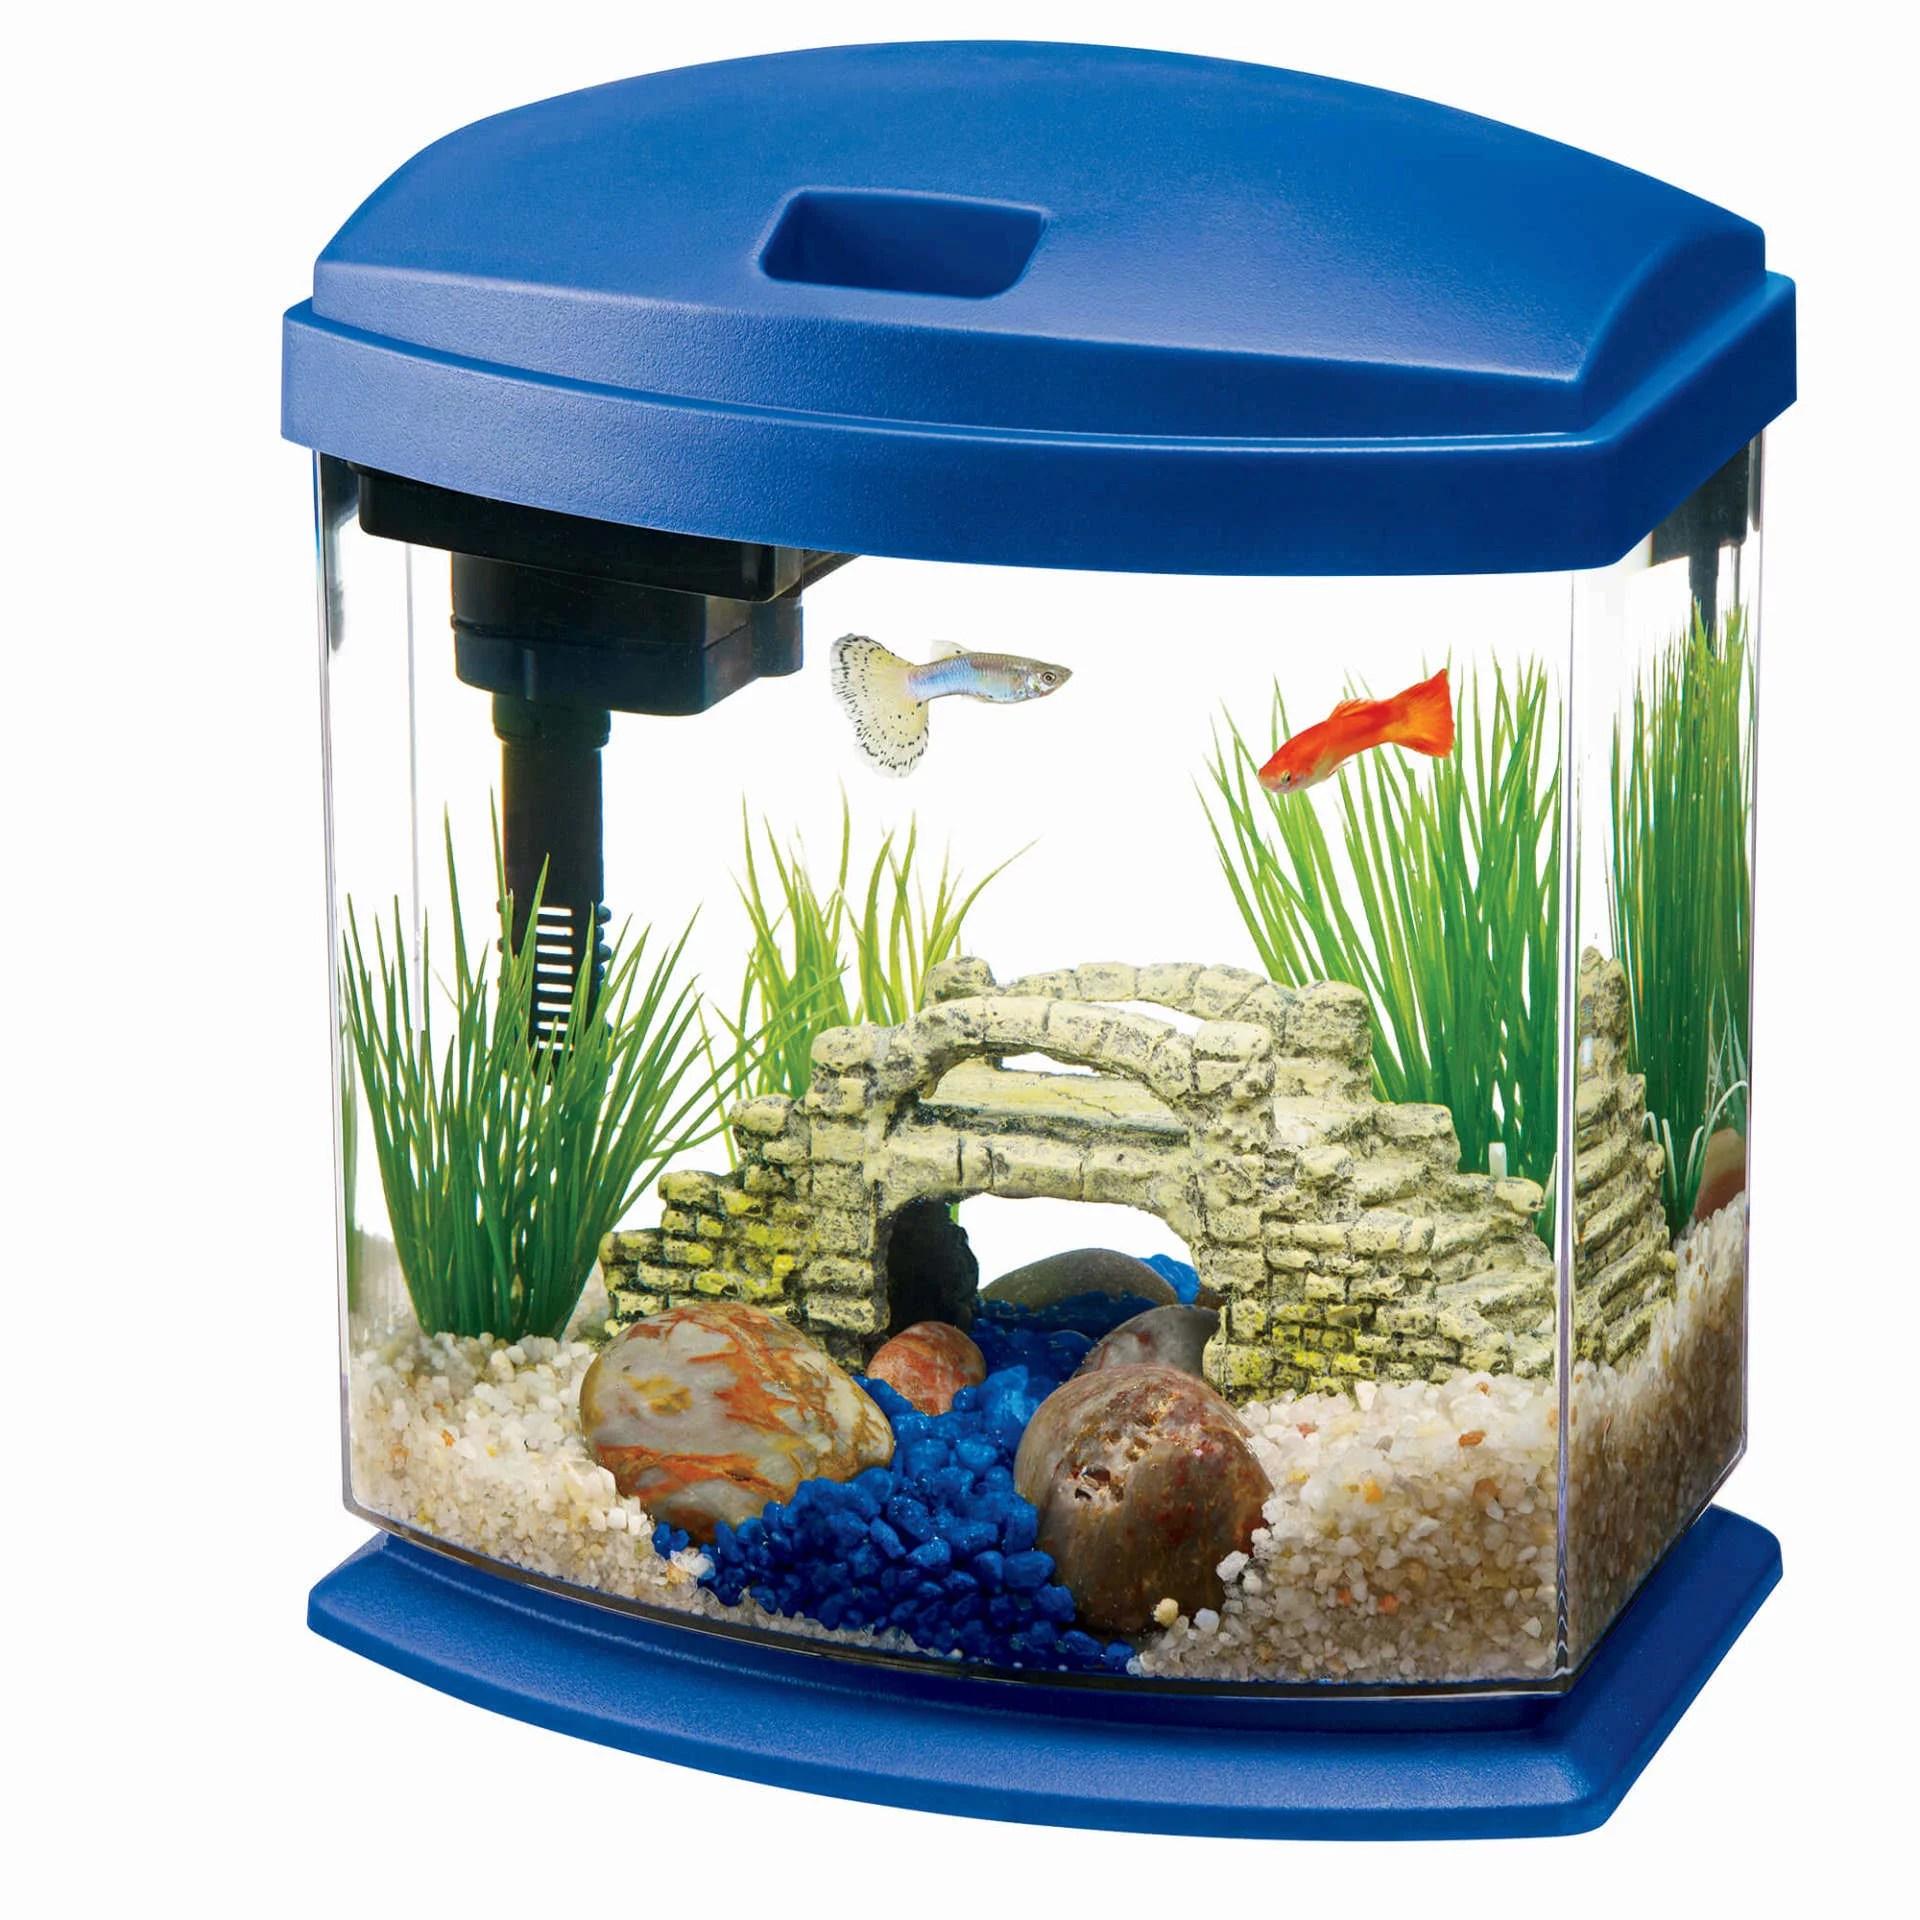 aqueon minibow aquarium led starter kit 1 gallon blue